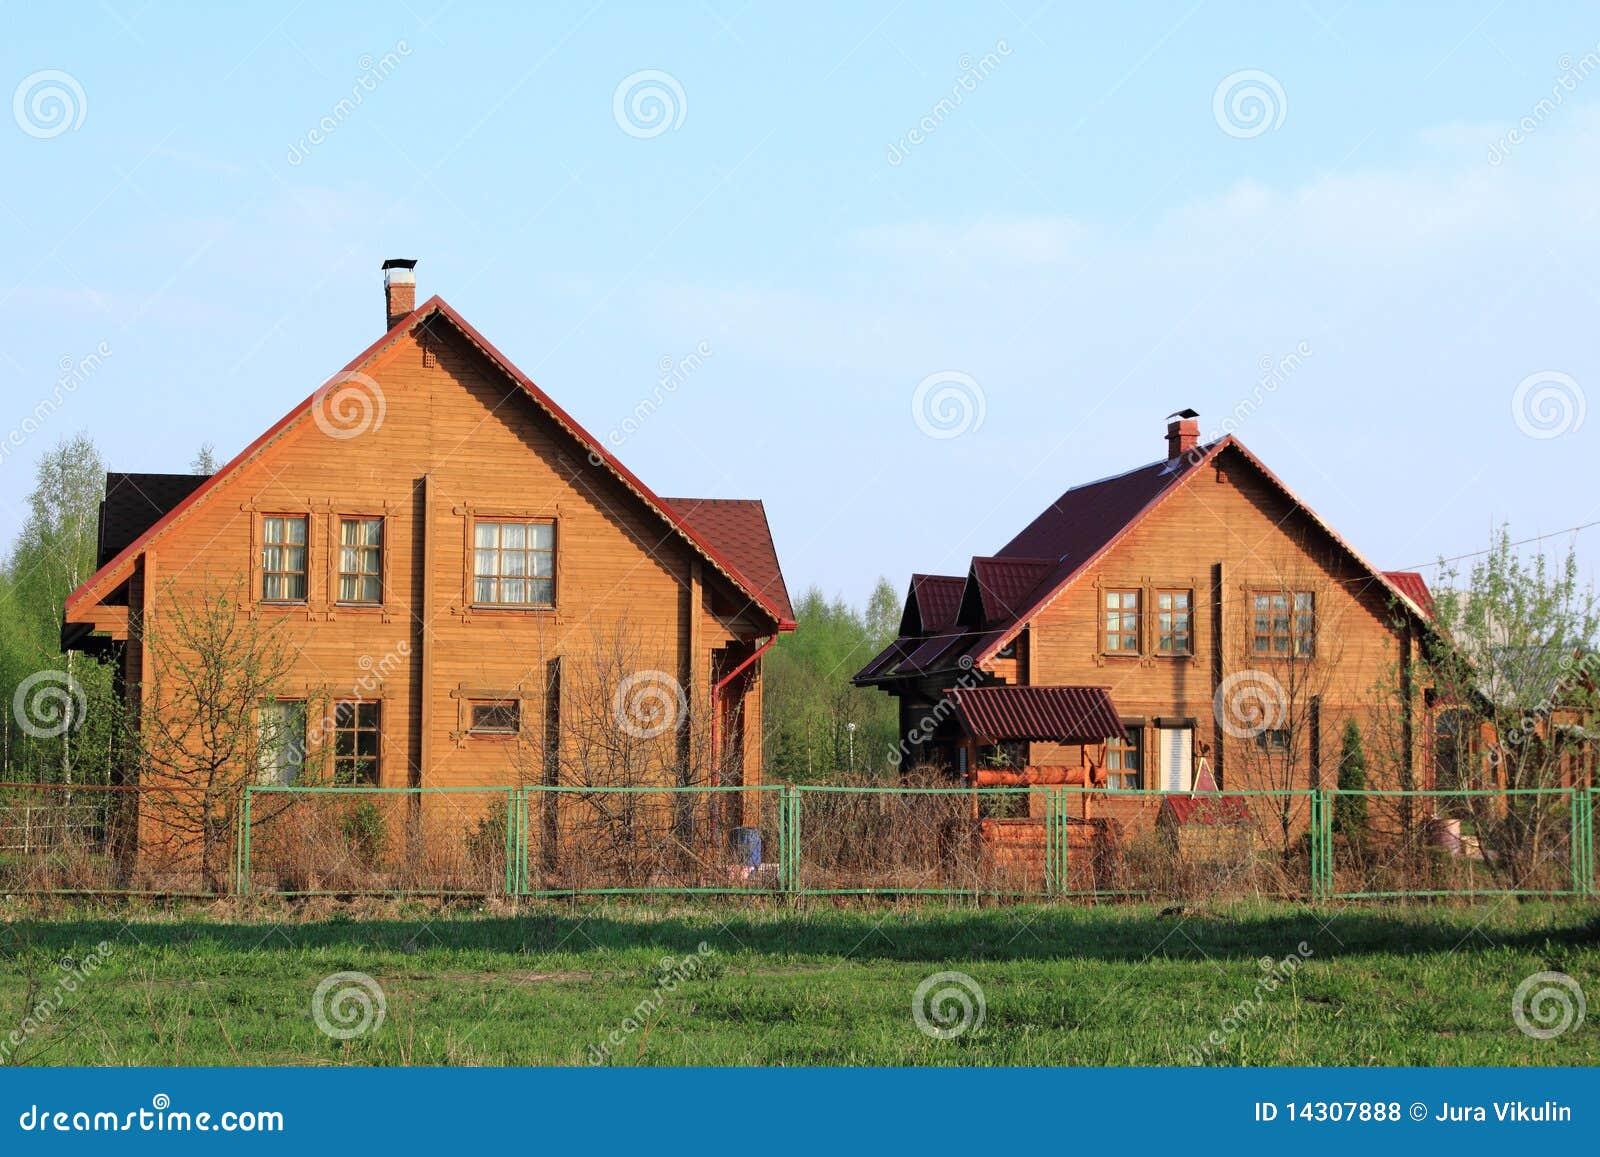 Casas de campo de madera fotos de archivo libres de - Casas de campo madera ...